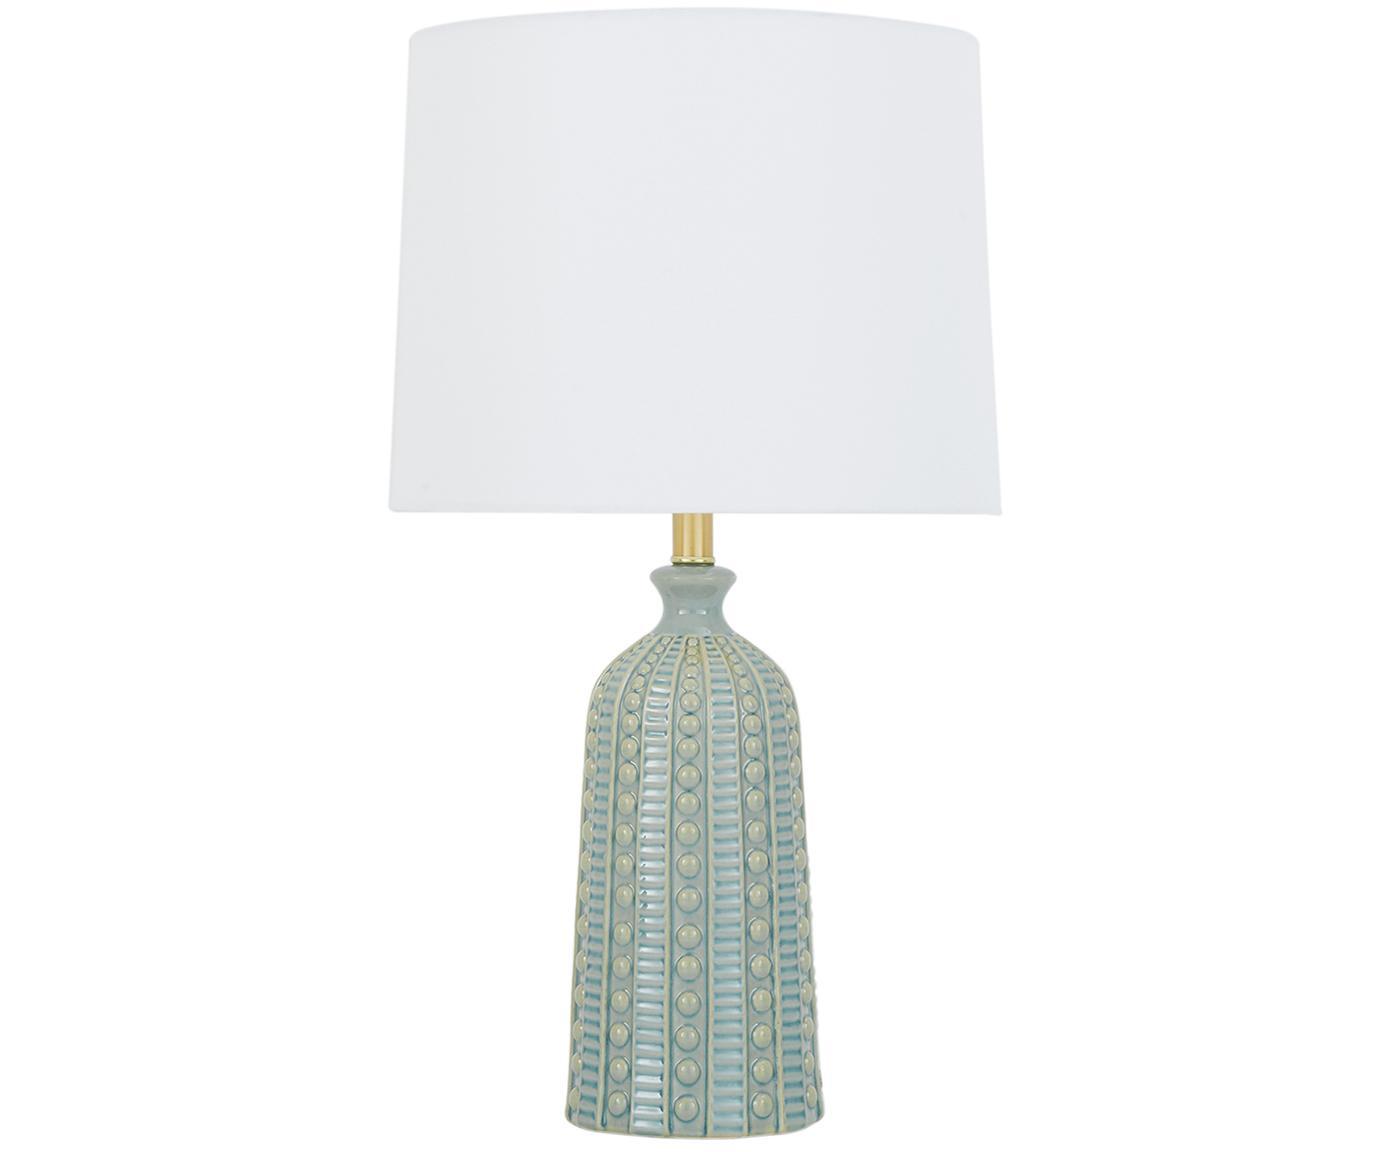 Lámpara de mesa Nizza, Pantalla: tela, Cable: plástico, Verde salvia, Ø 35 x Al 60 cm